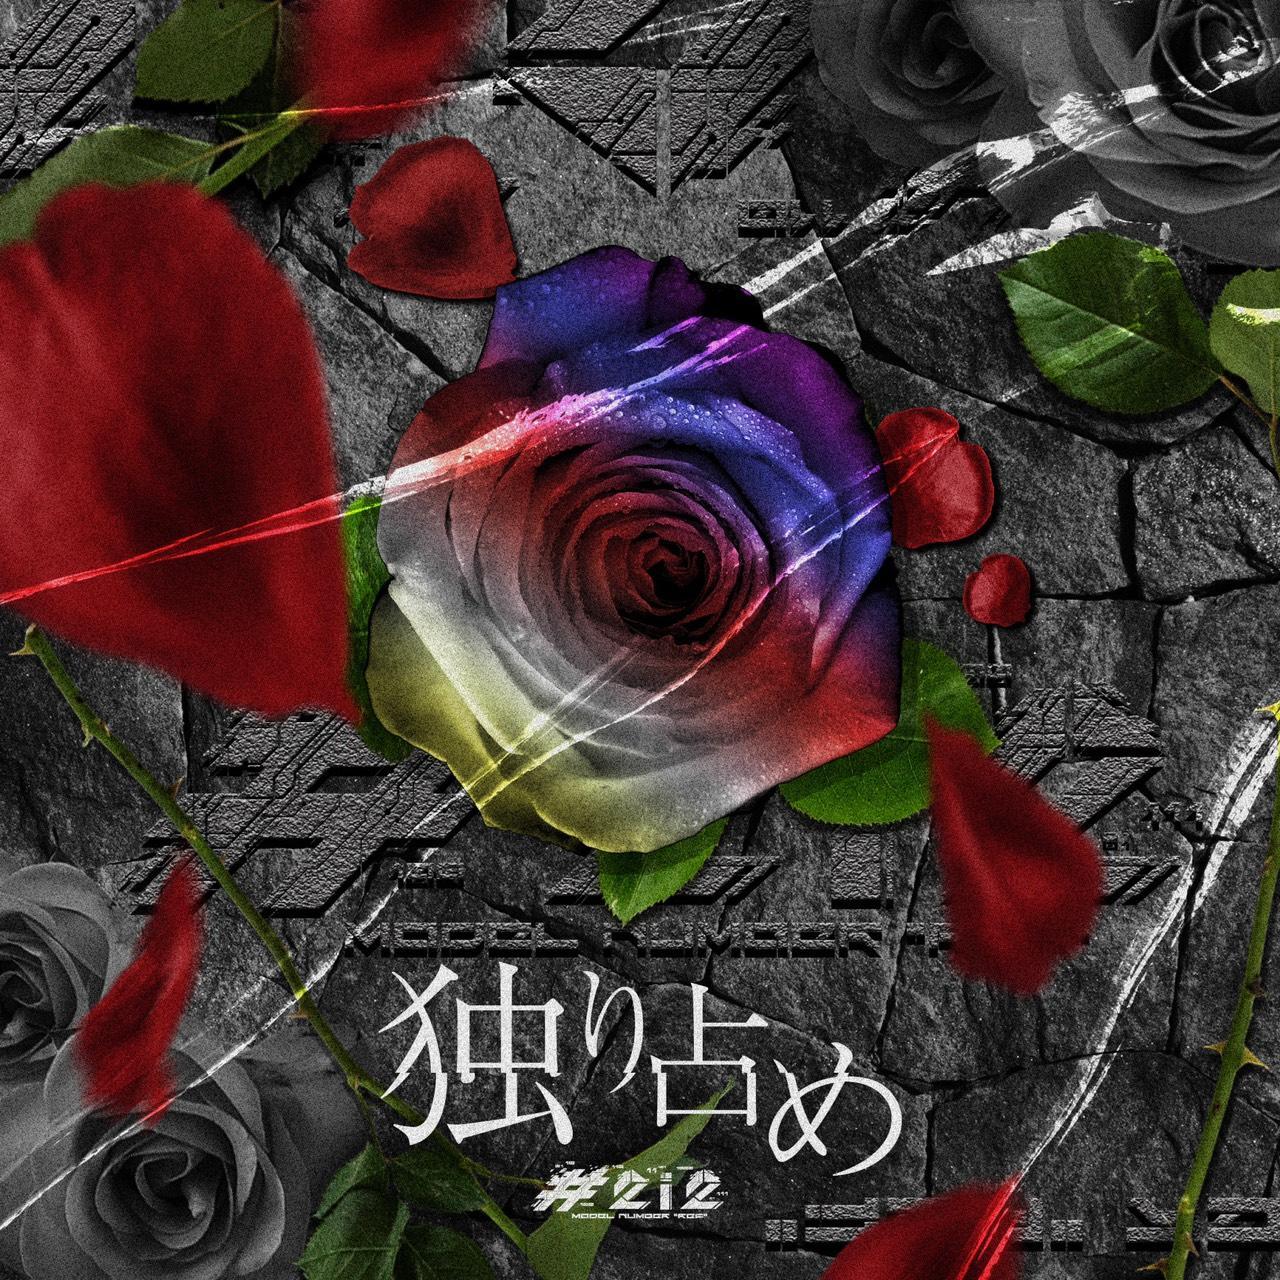 【#2i2】独り占め:タワーレコード限定CD